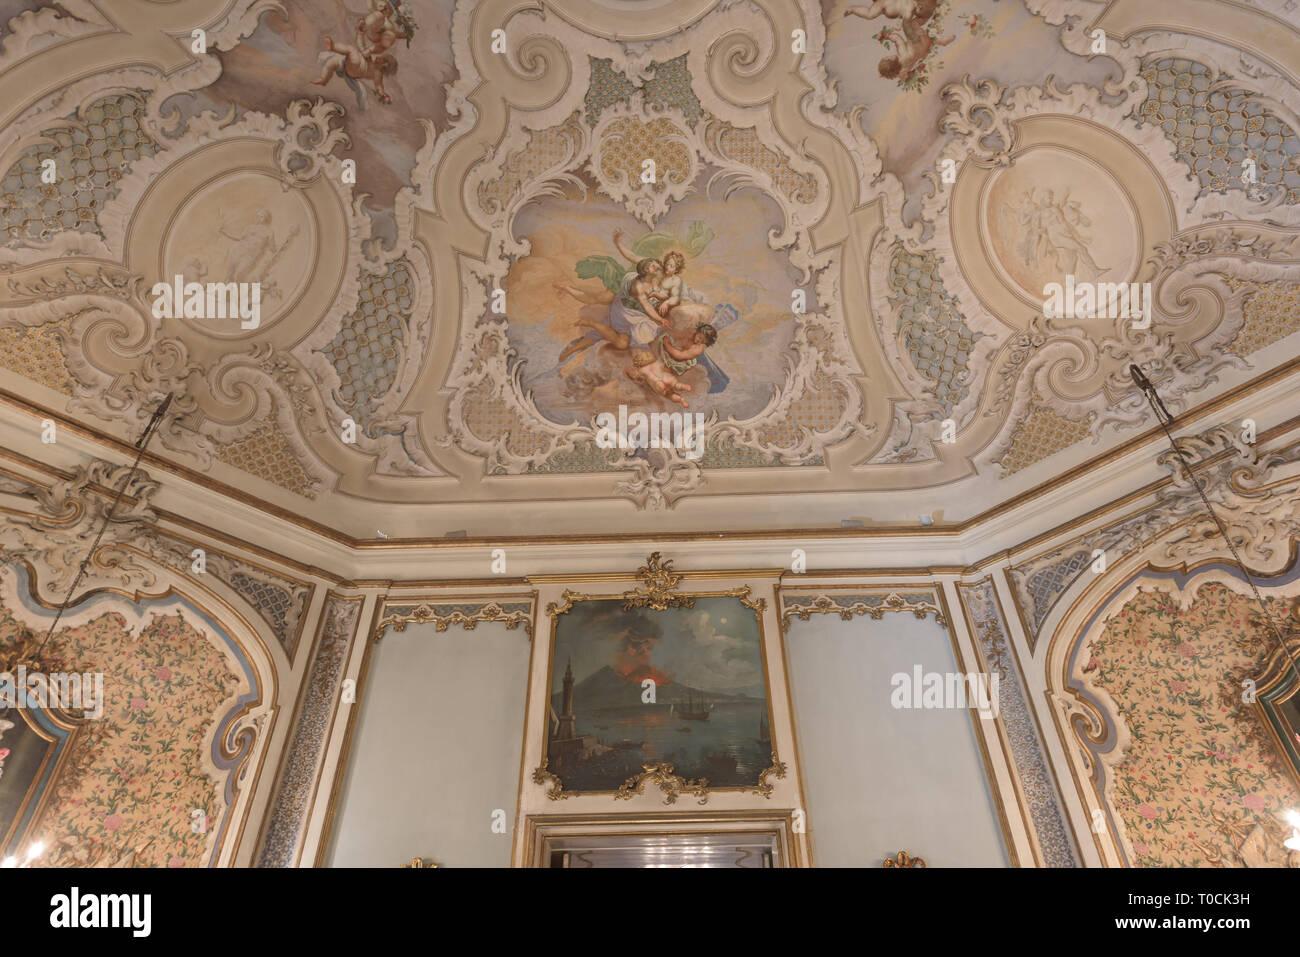 Matrimonio Country Chic Catania : Biscari stock photos & biscari stock images alamy